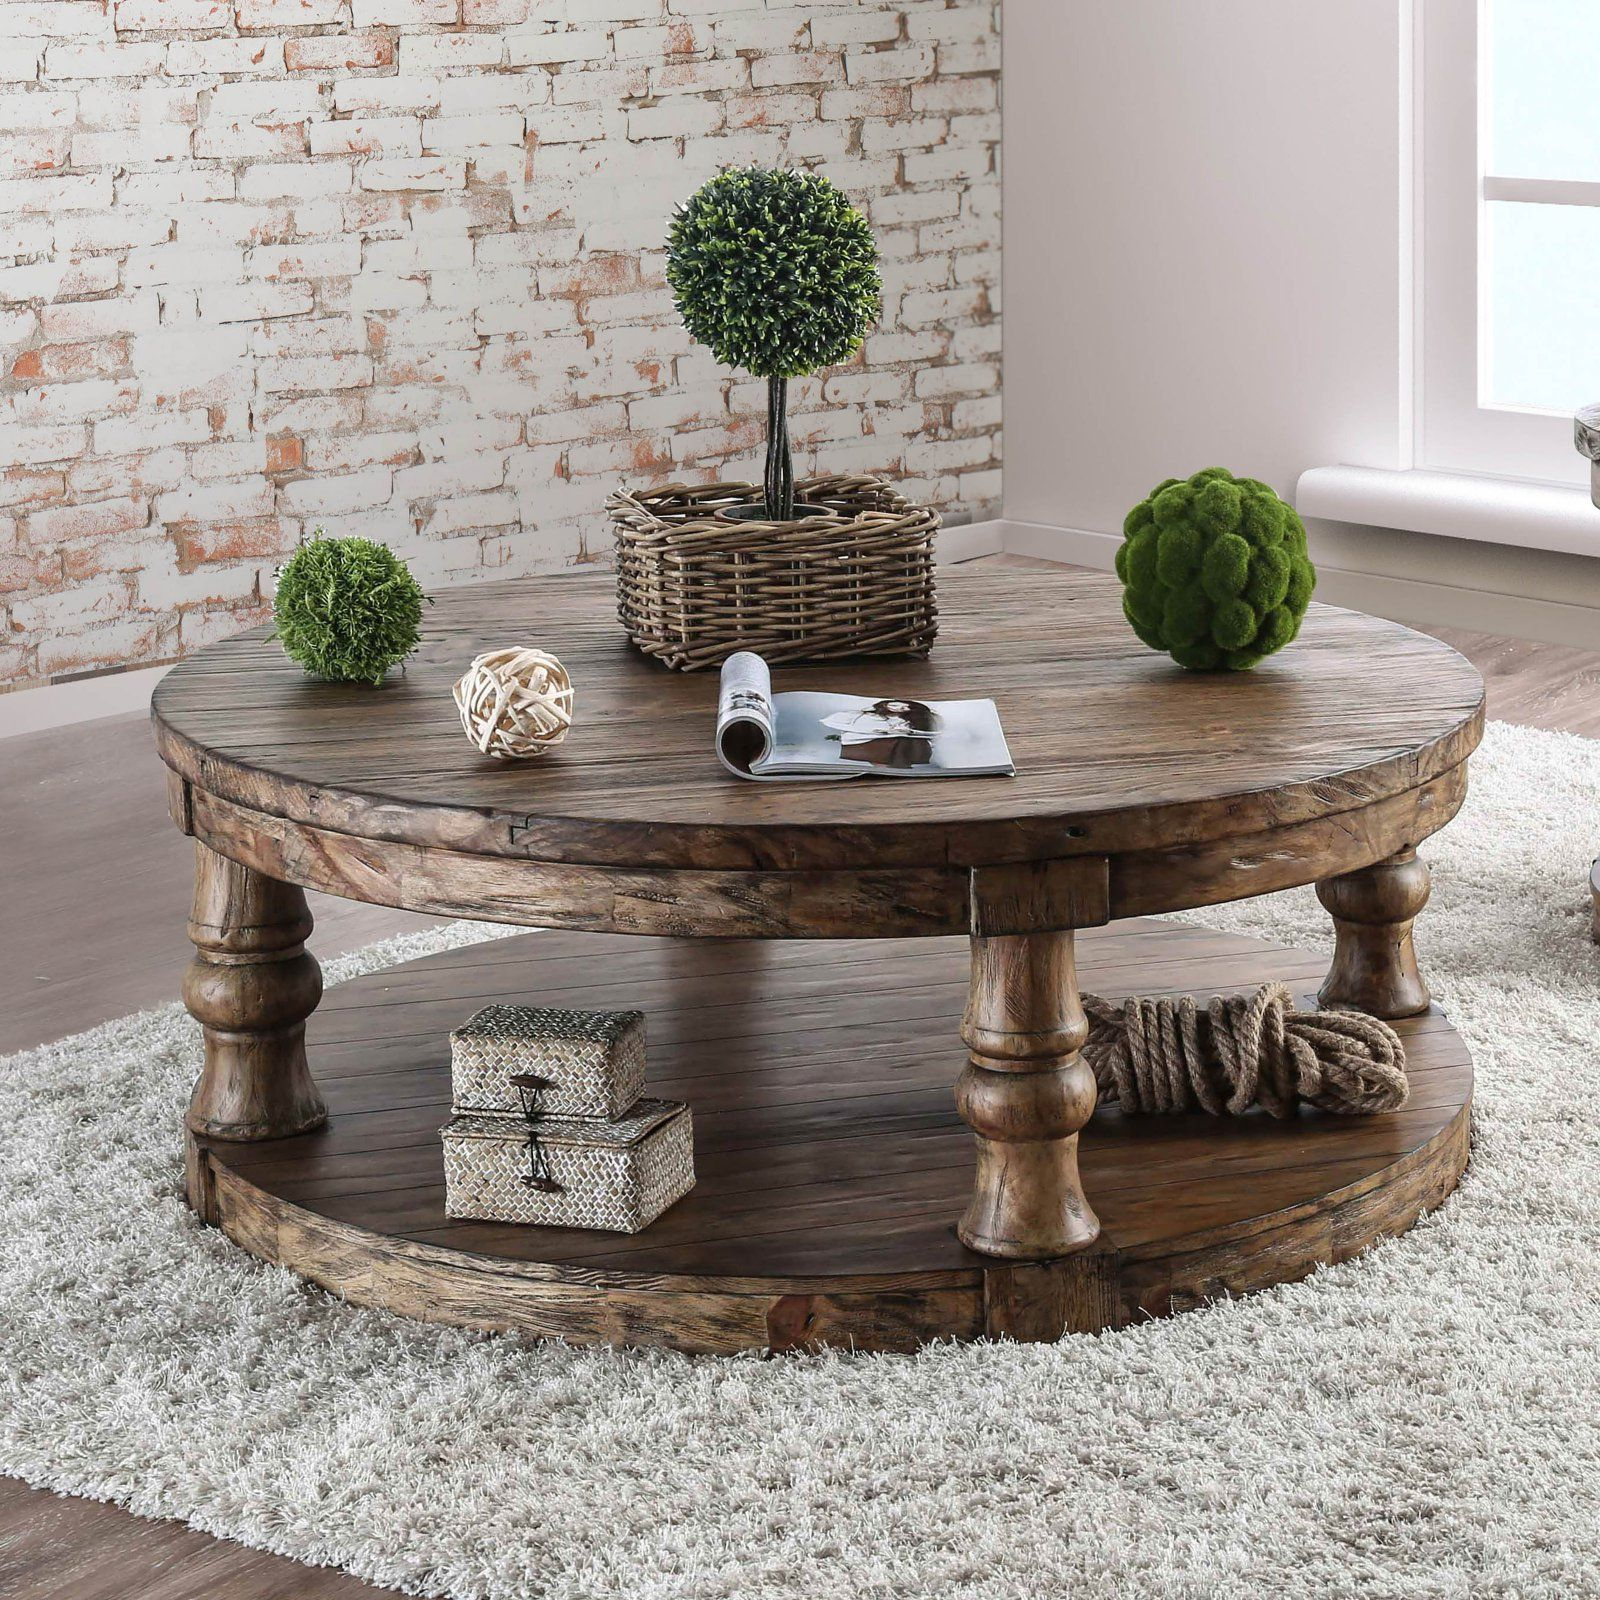 Furniture of America Tanenbaum Rustic Round Coffee Table